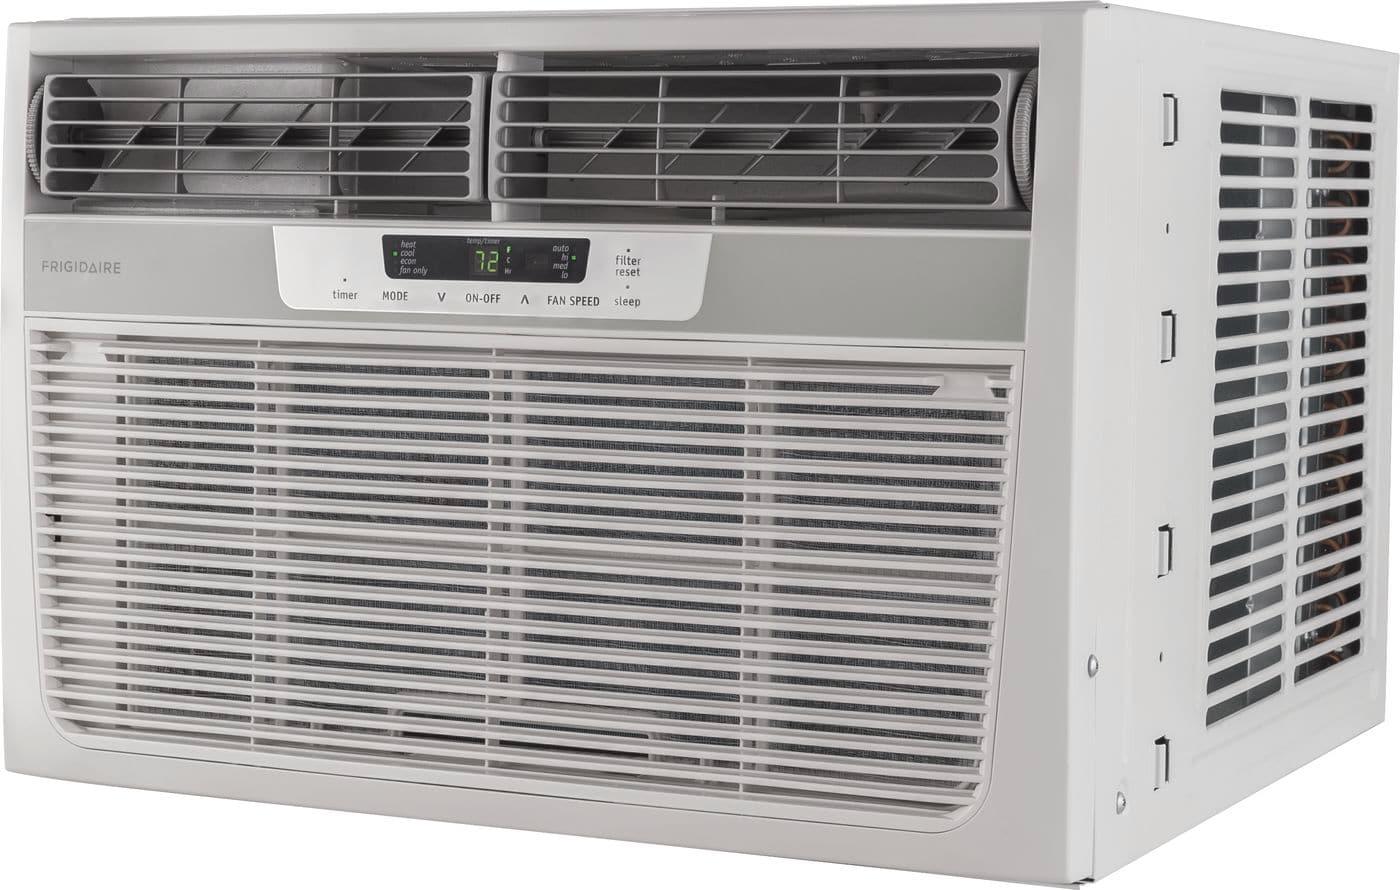 Model: FFRH0822R1 | Frigidaire 8,000 BTU Window-Mounted Room Air Conditioner with Supplemental Heat